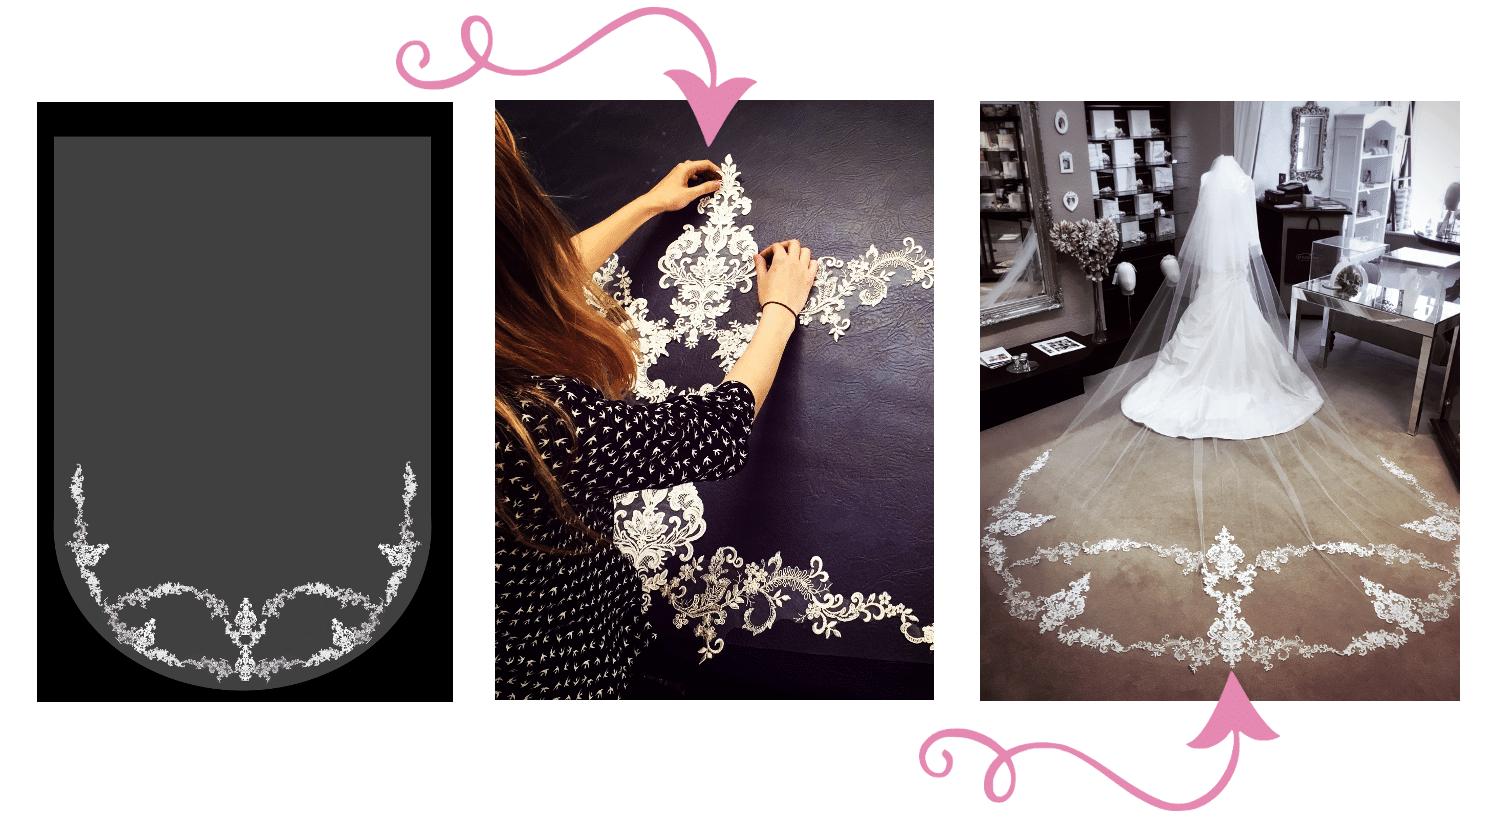 Rohanna Whittle custom lace veil process